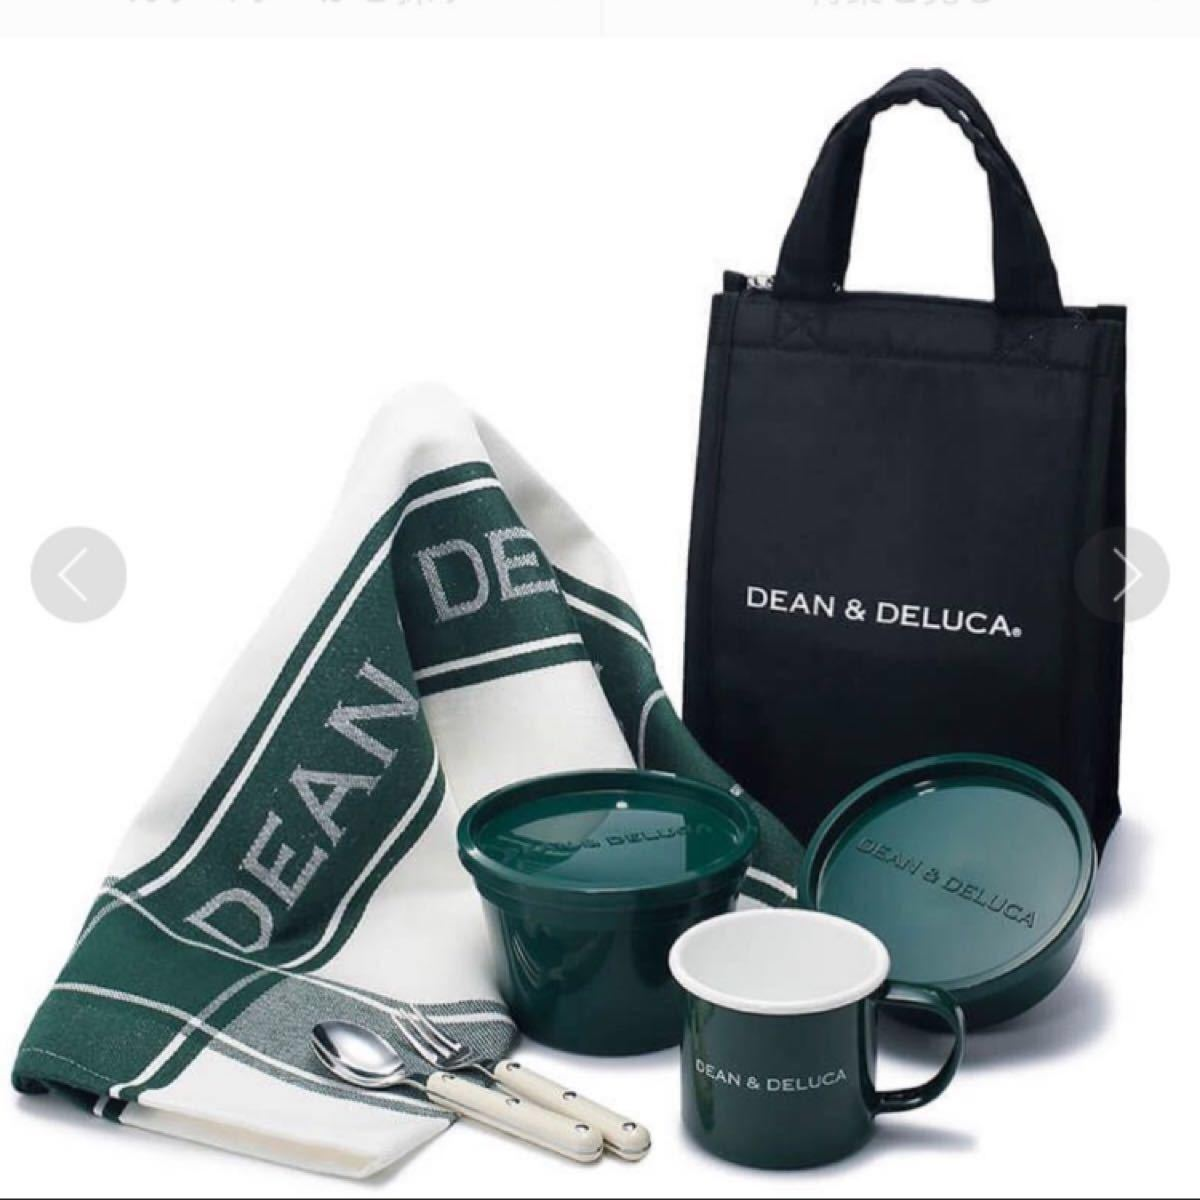 DEAN&DELUCA  ディーンアンドデルーカ グリーンセット 限定  保冷バッグ 容器 ホーロー タオル フォーク スプーン